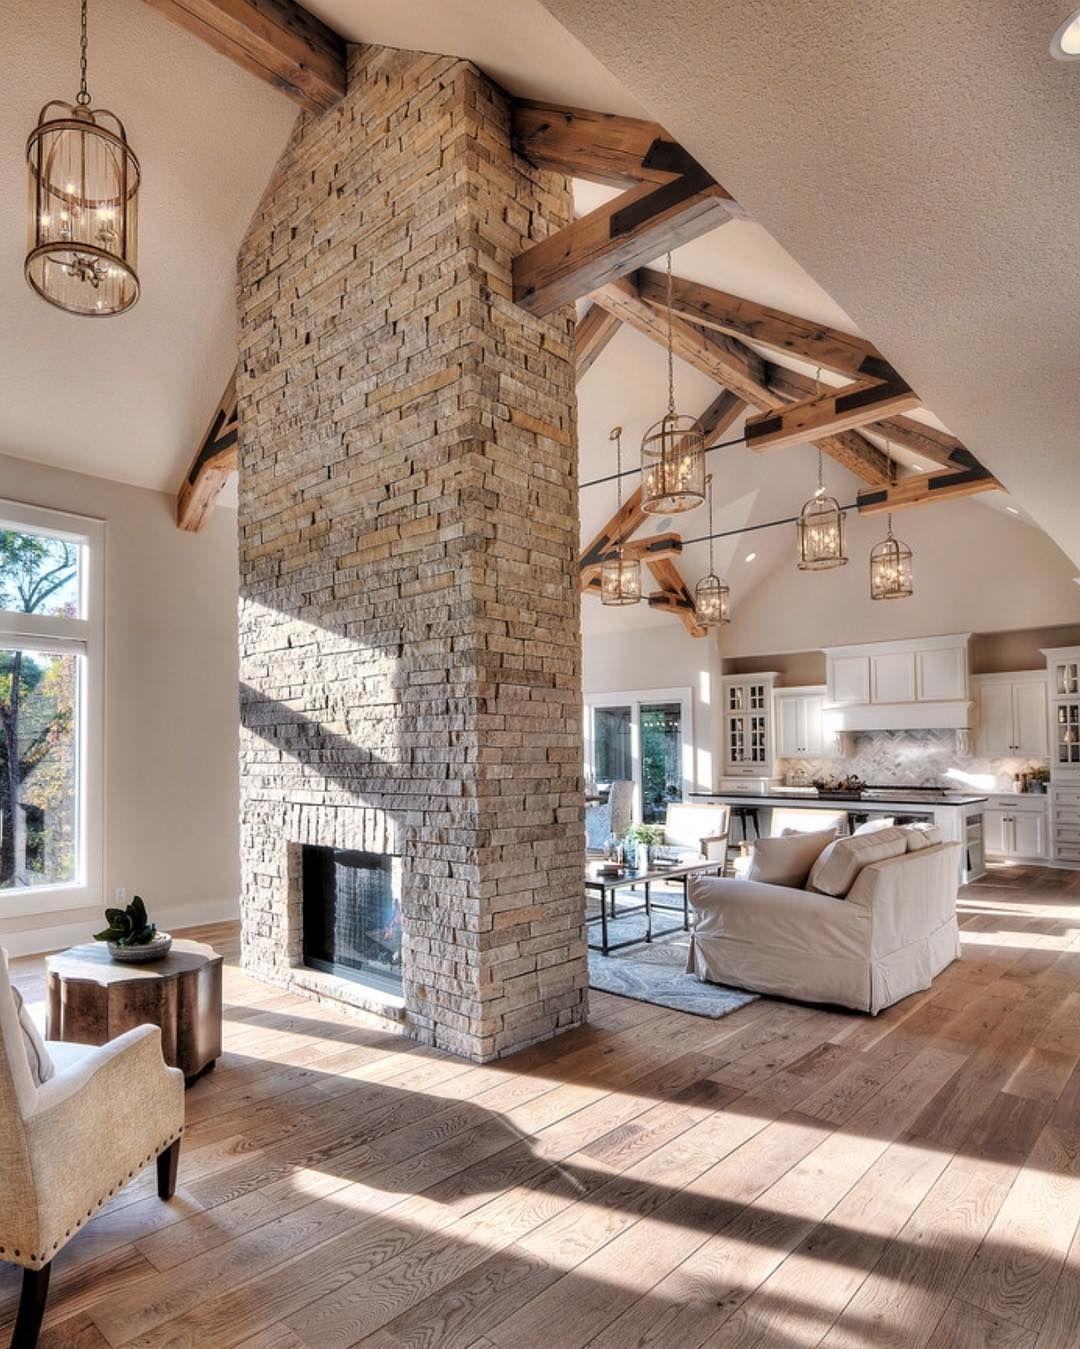 28k Likes, 308 Comments - Interior Design